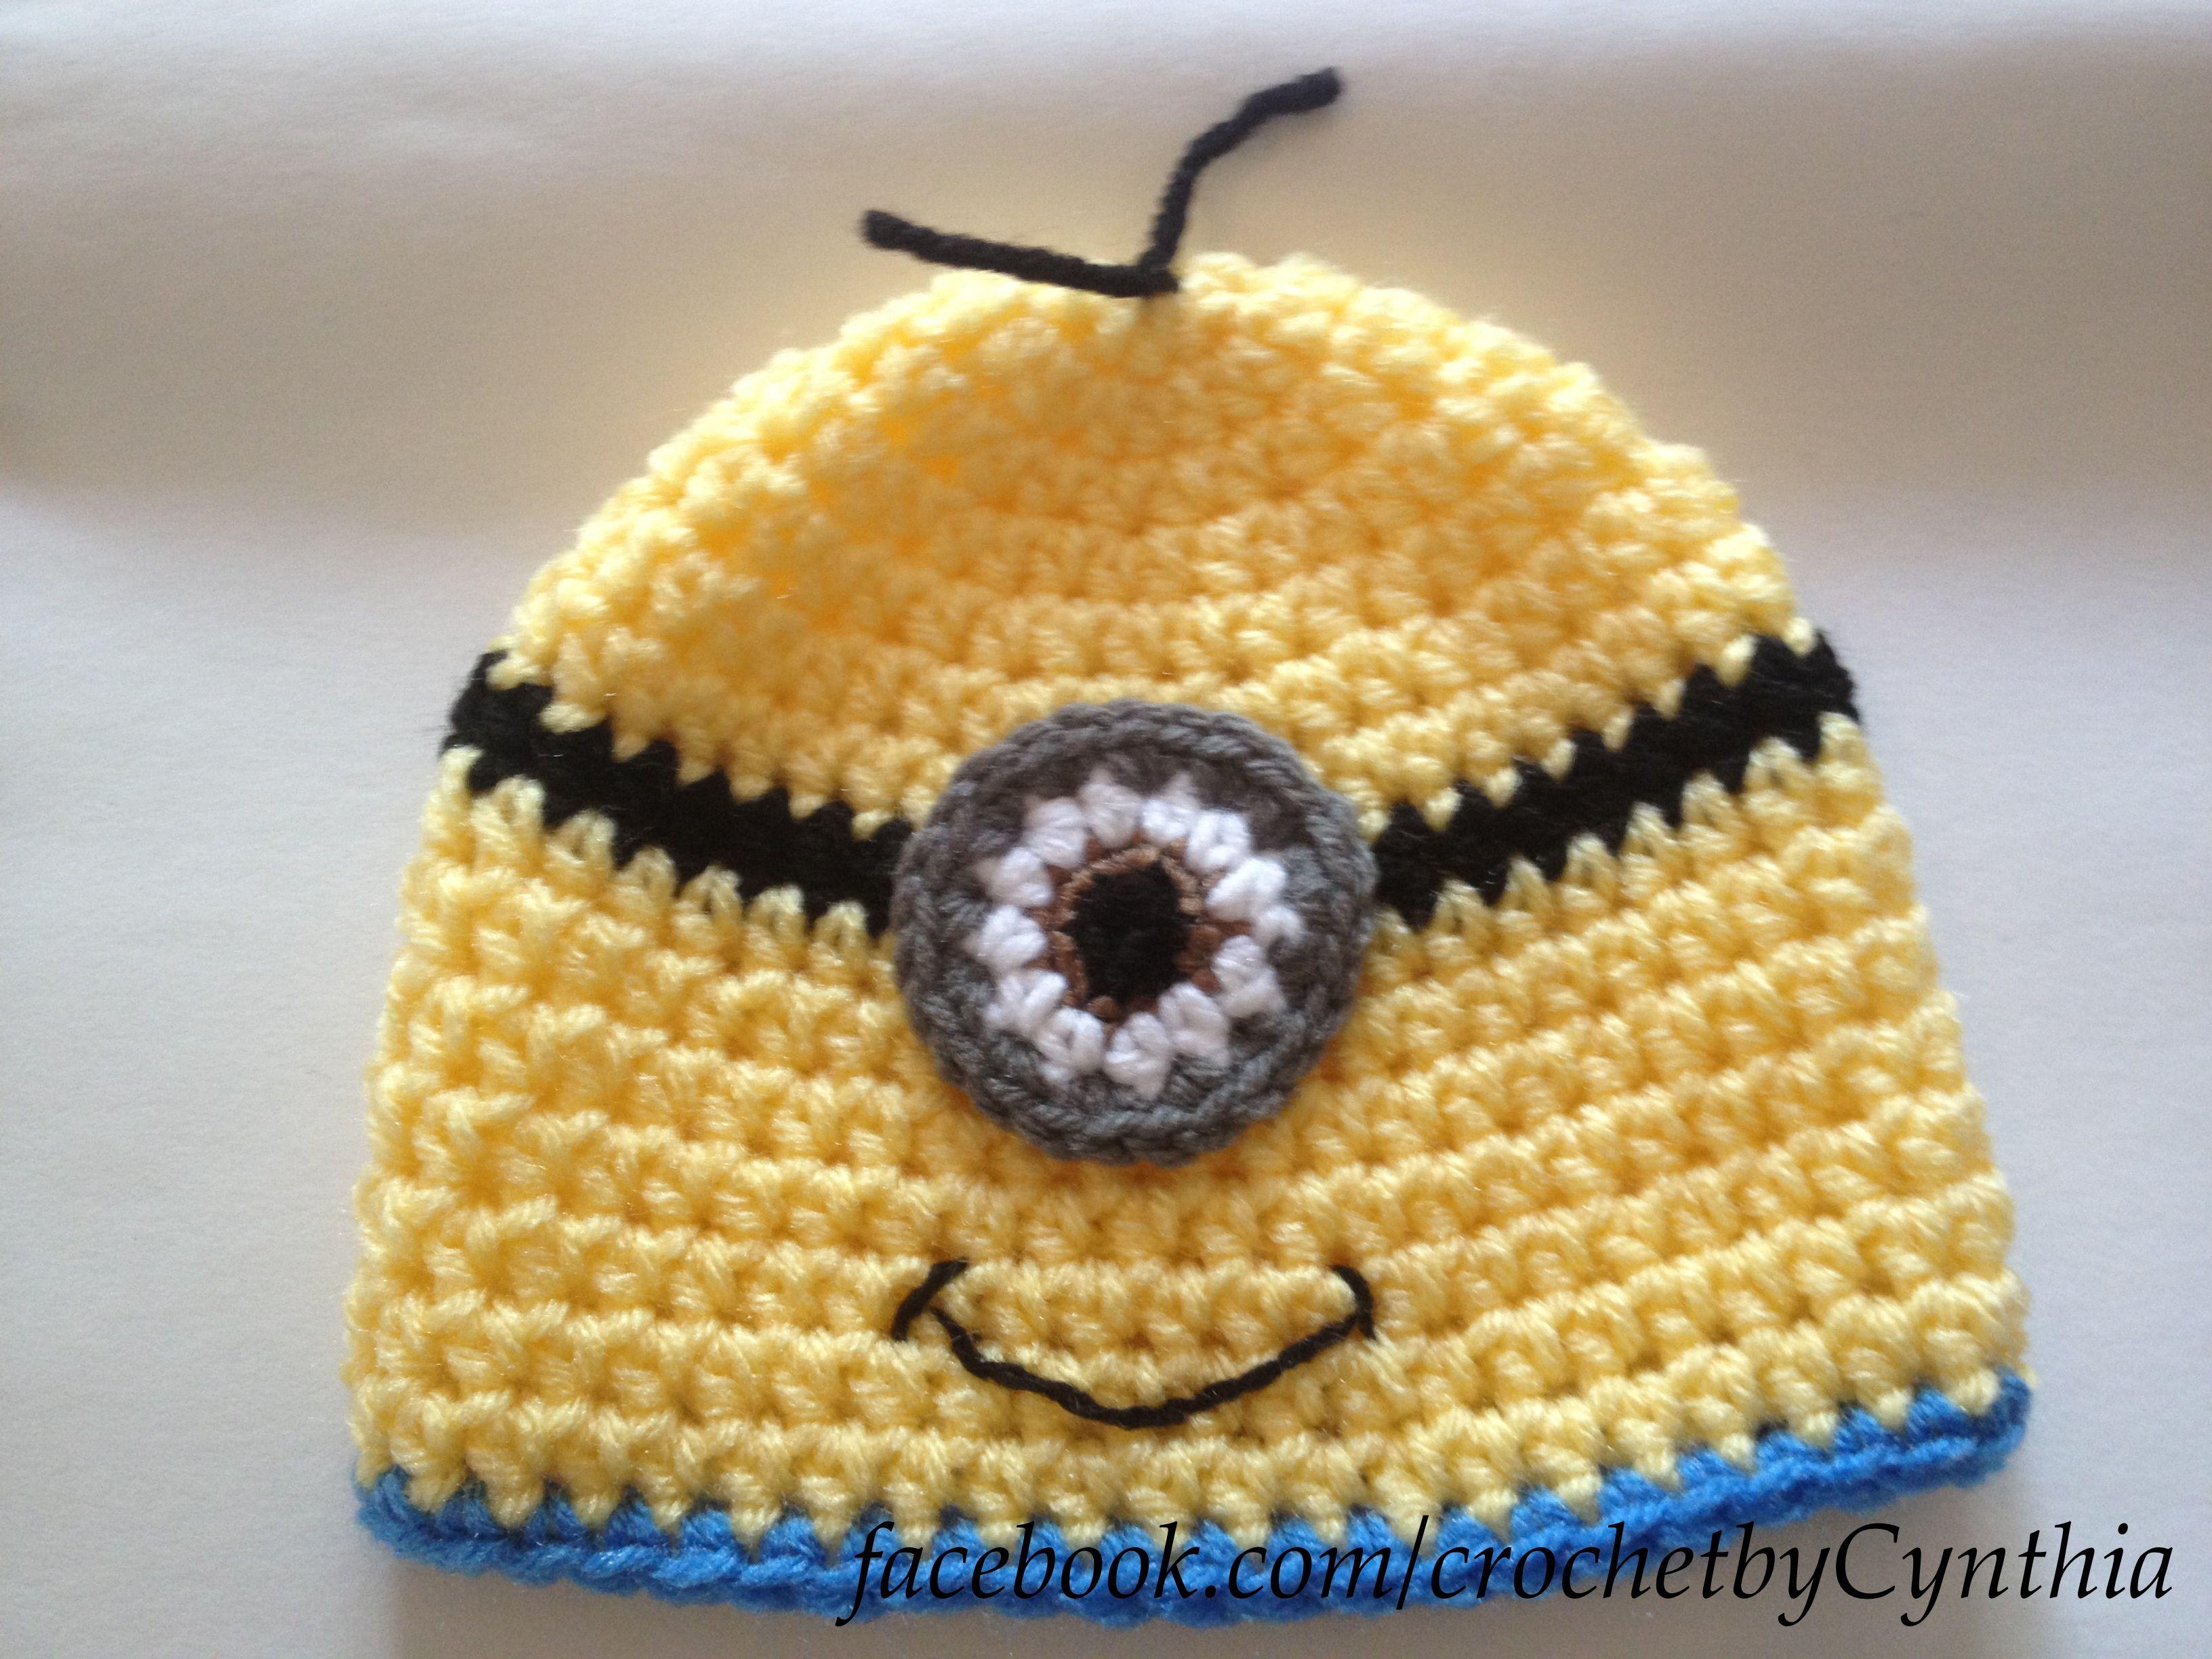 crochet hat- despicable me minion inspired | Crochet! | Pinterest